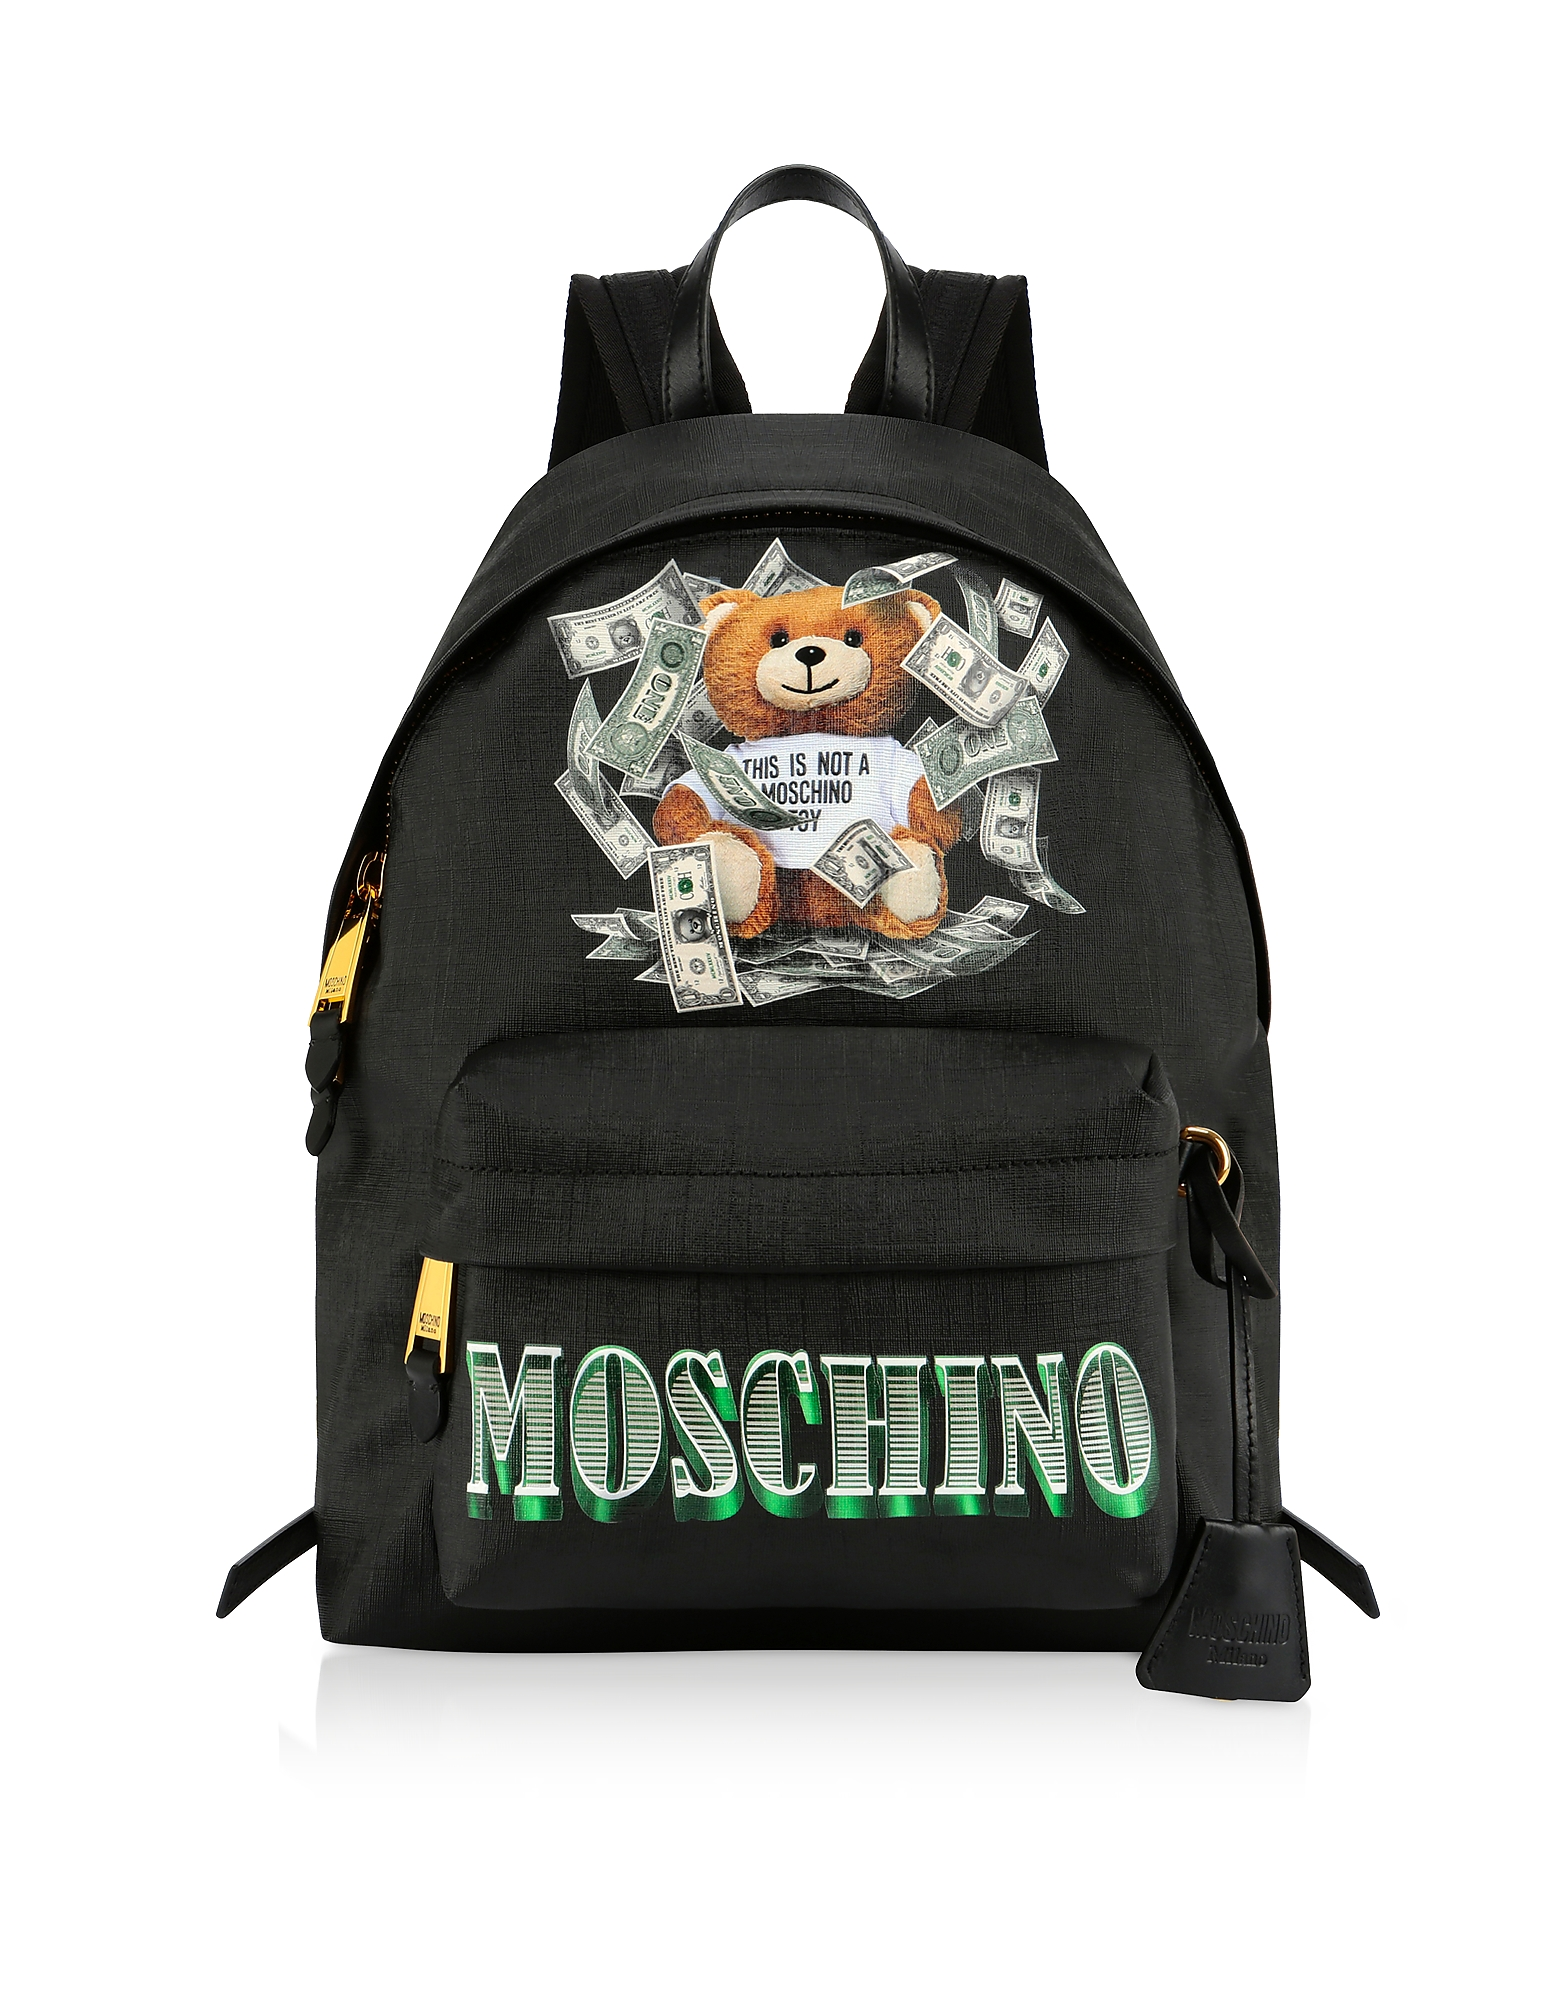 UPC 657536150909 product image for Moschino Designer Handbags, Dollar Teddy Bear Black Backpack | upcitemdb.com